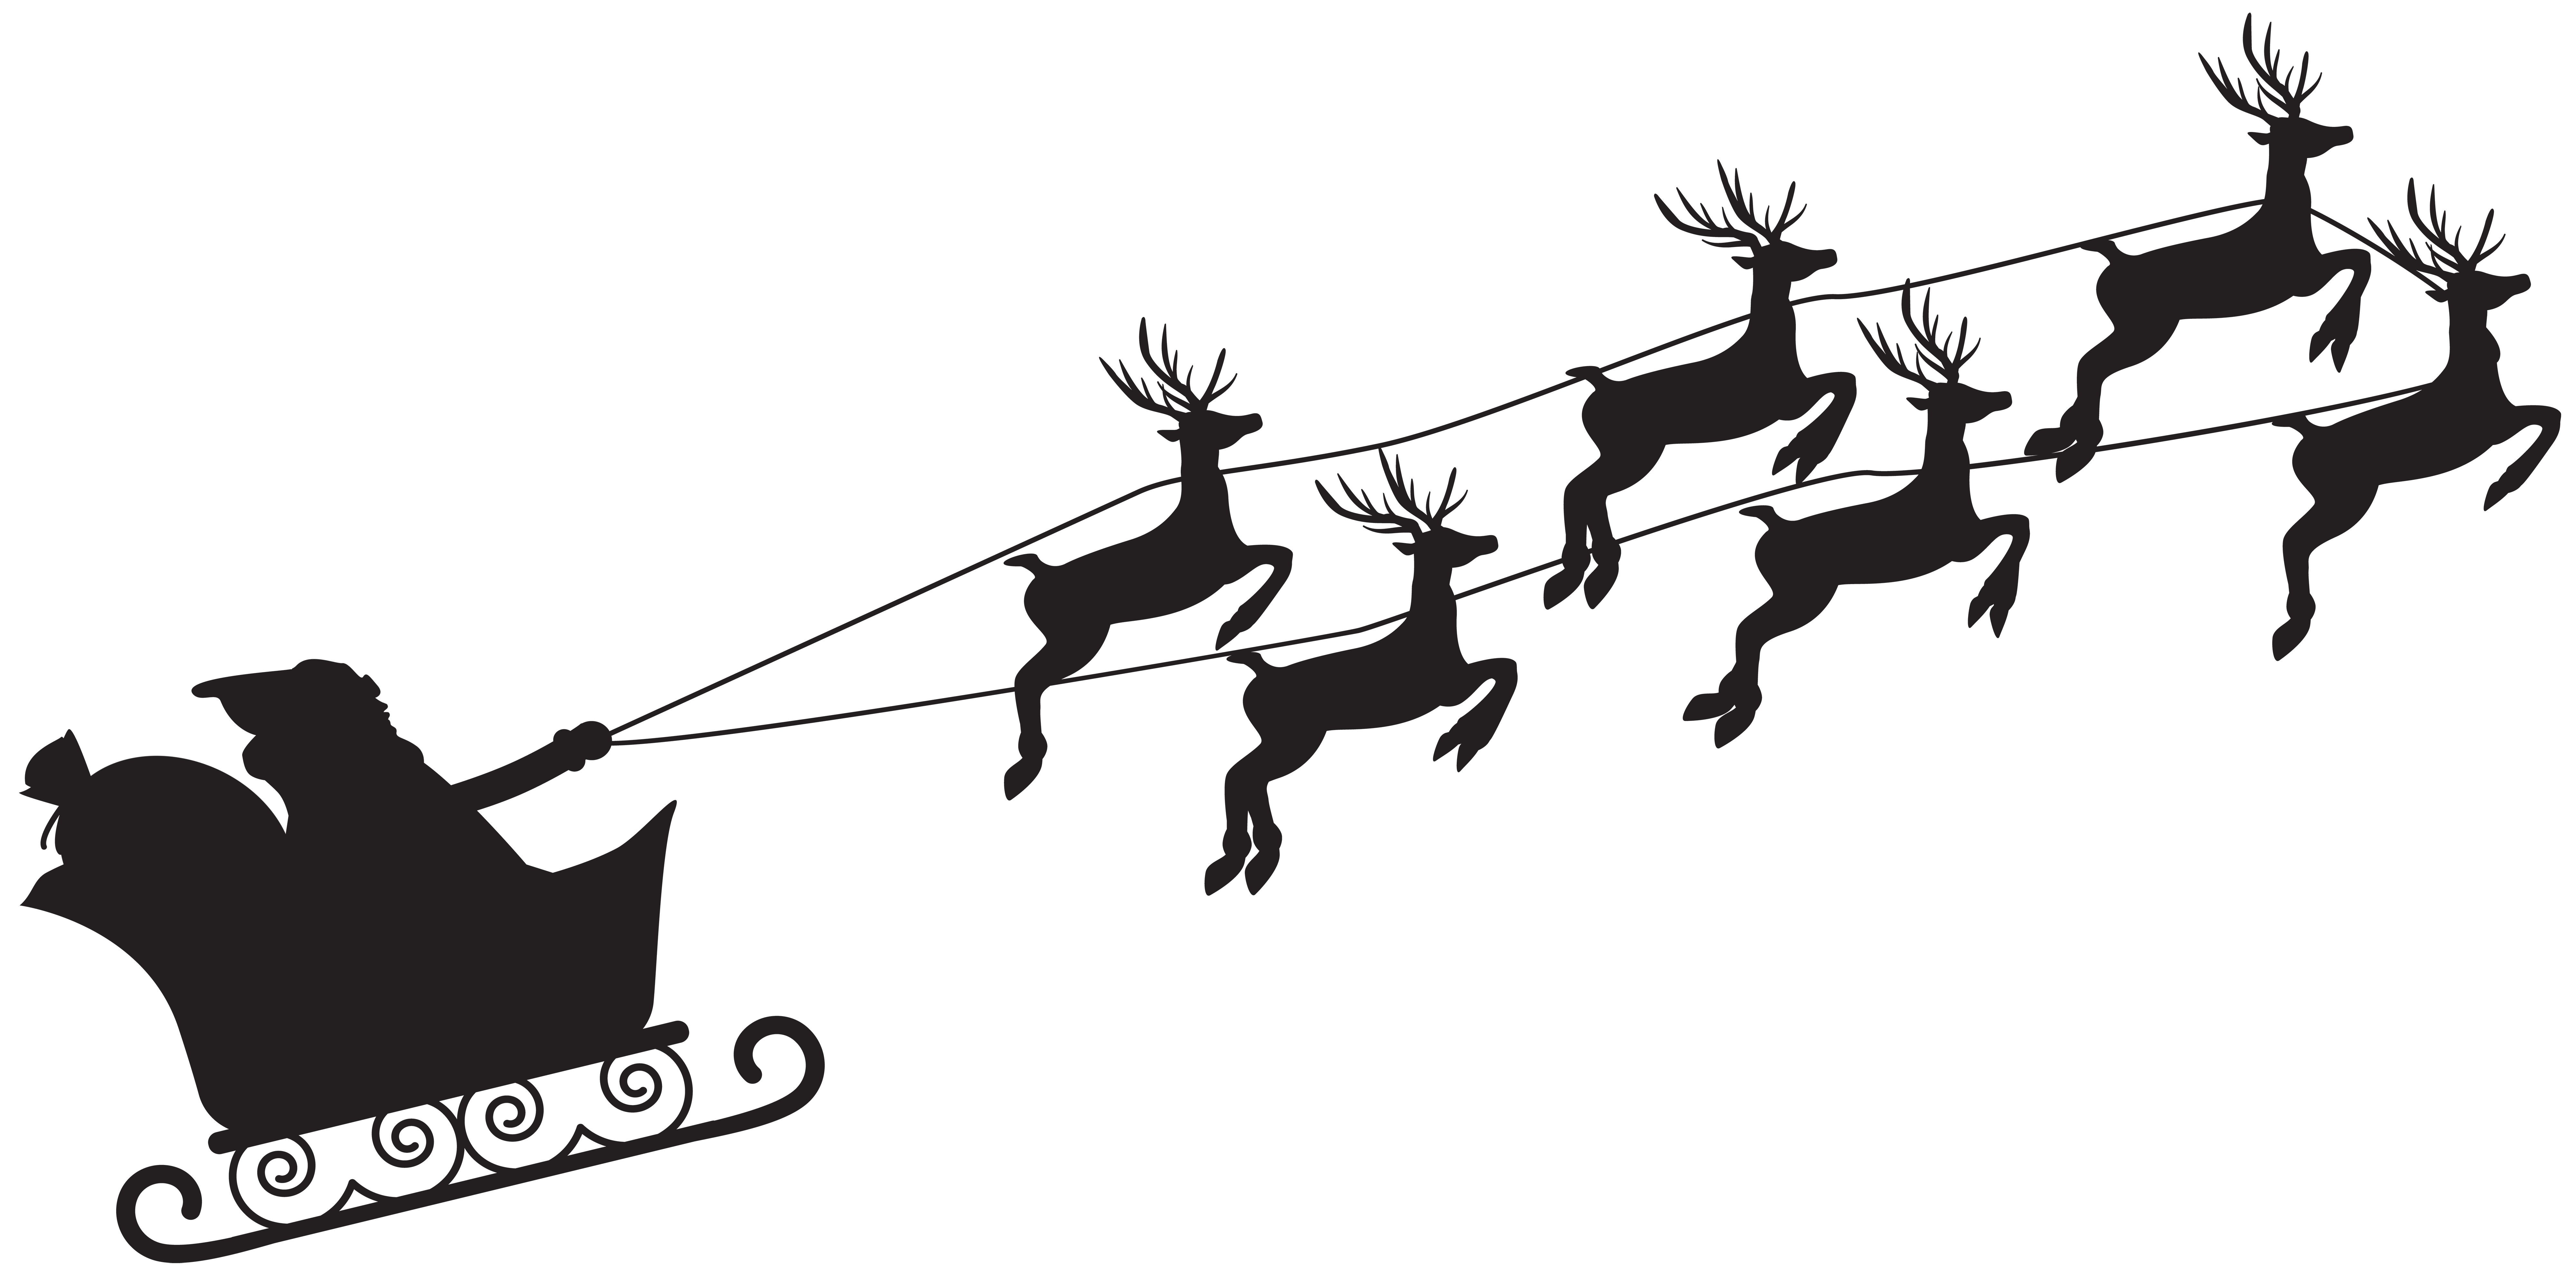 8000x3969 Santa Claus Silhouette Png Clip Artu200b Gallery Yopriceville